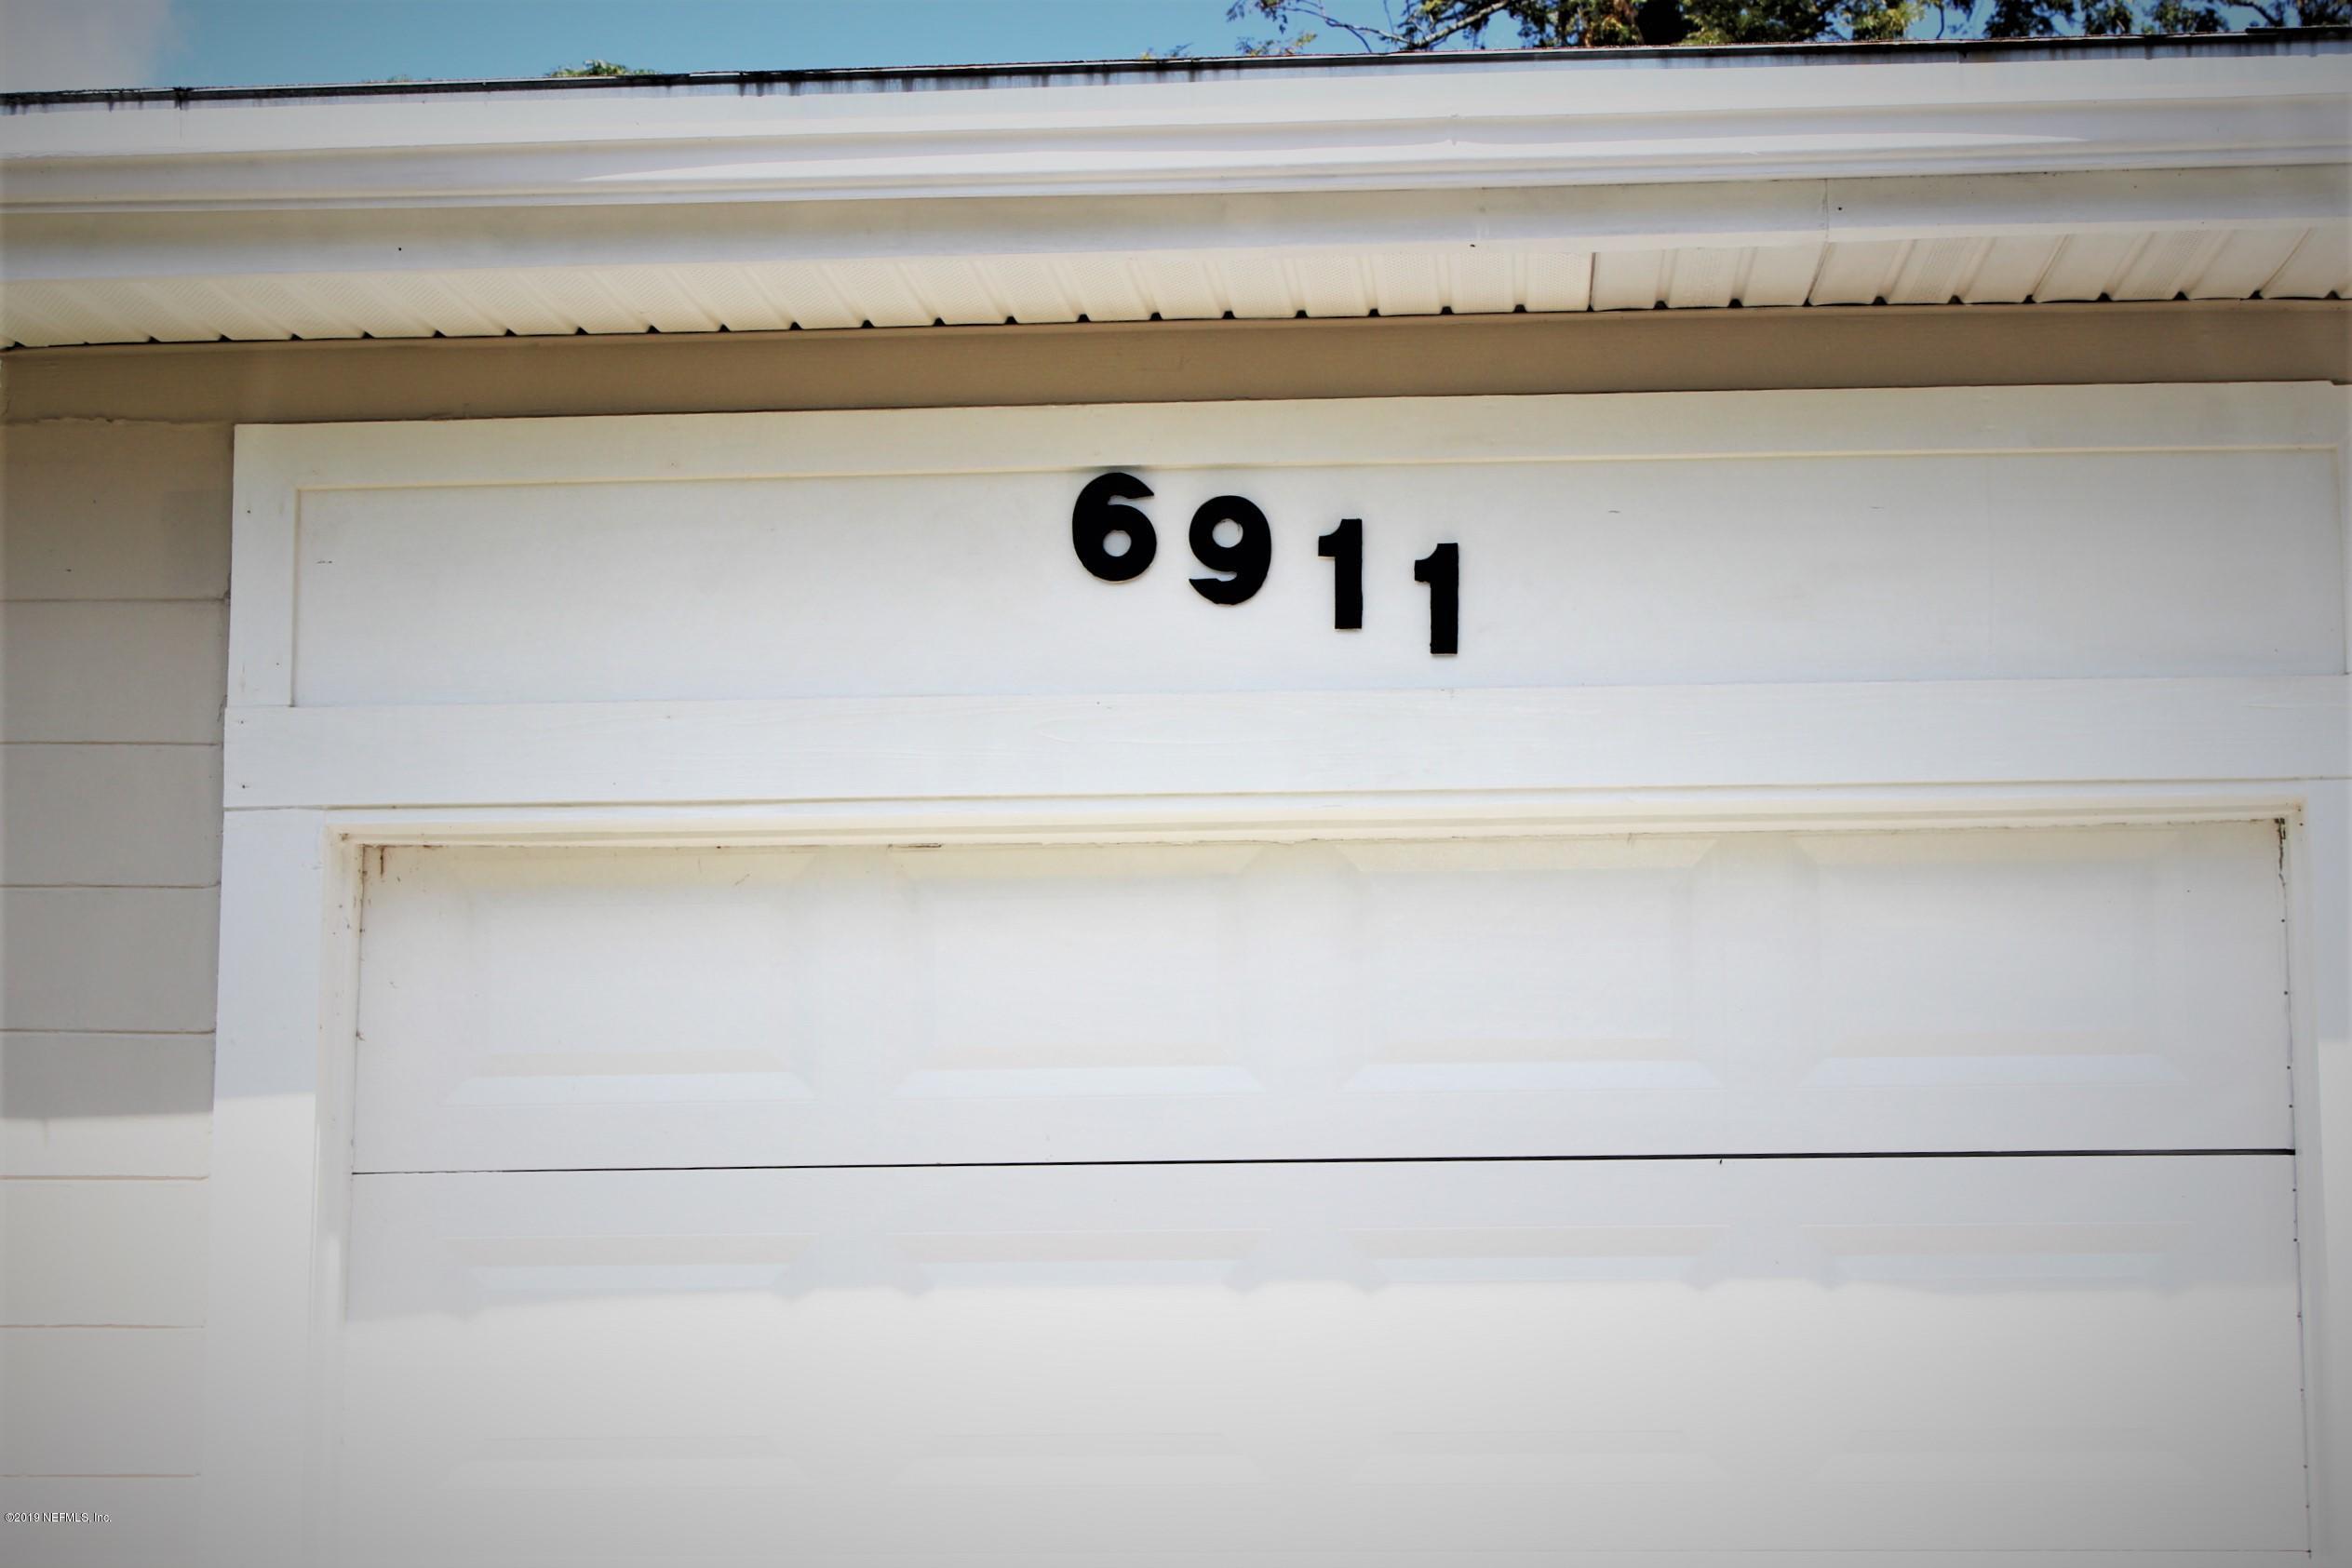 6911 Mayapple Rd